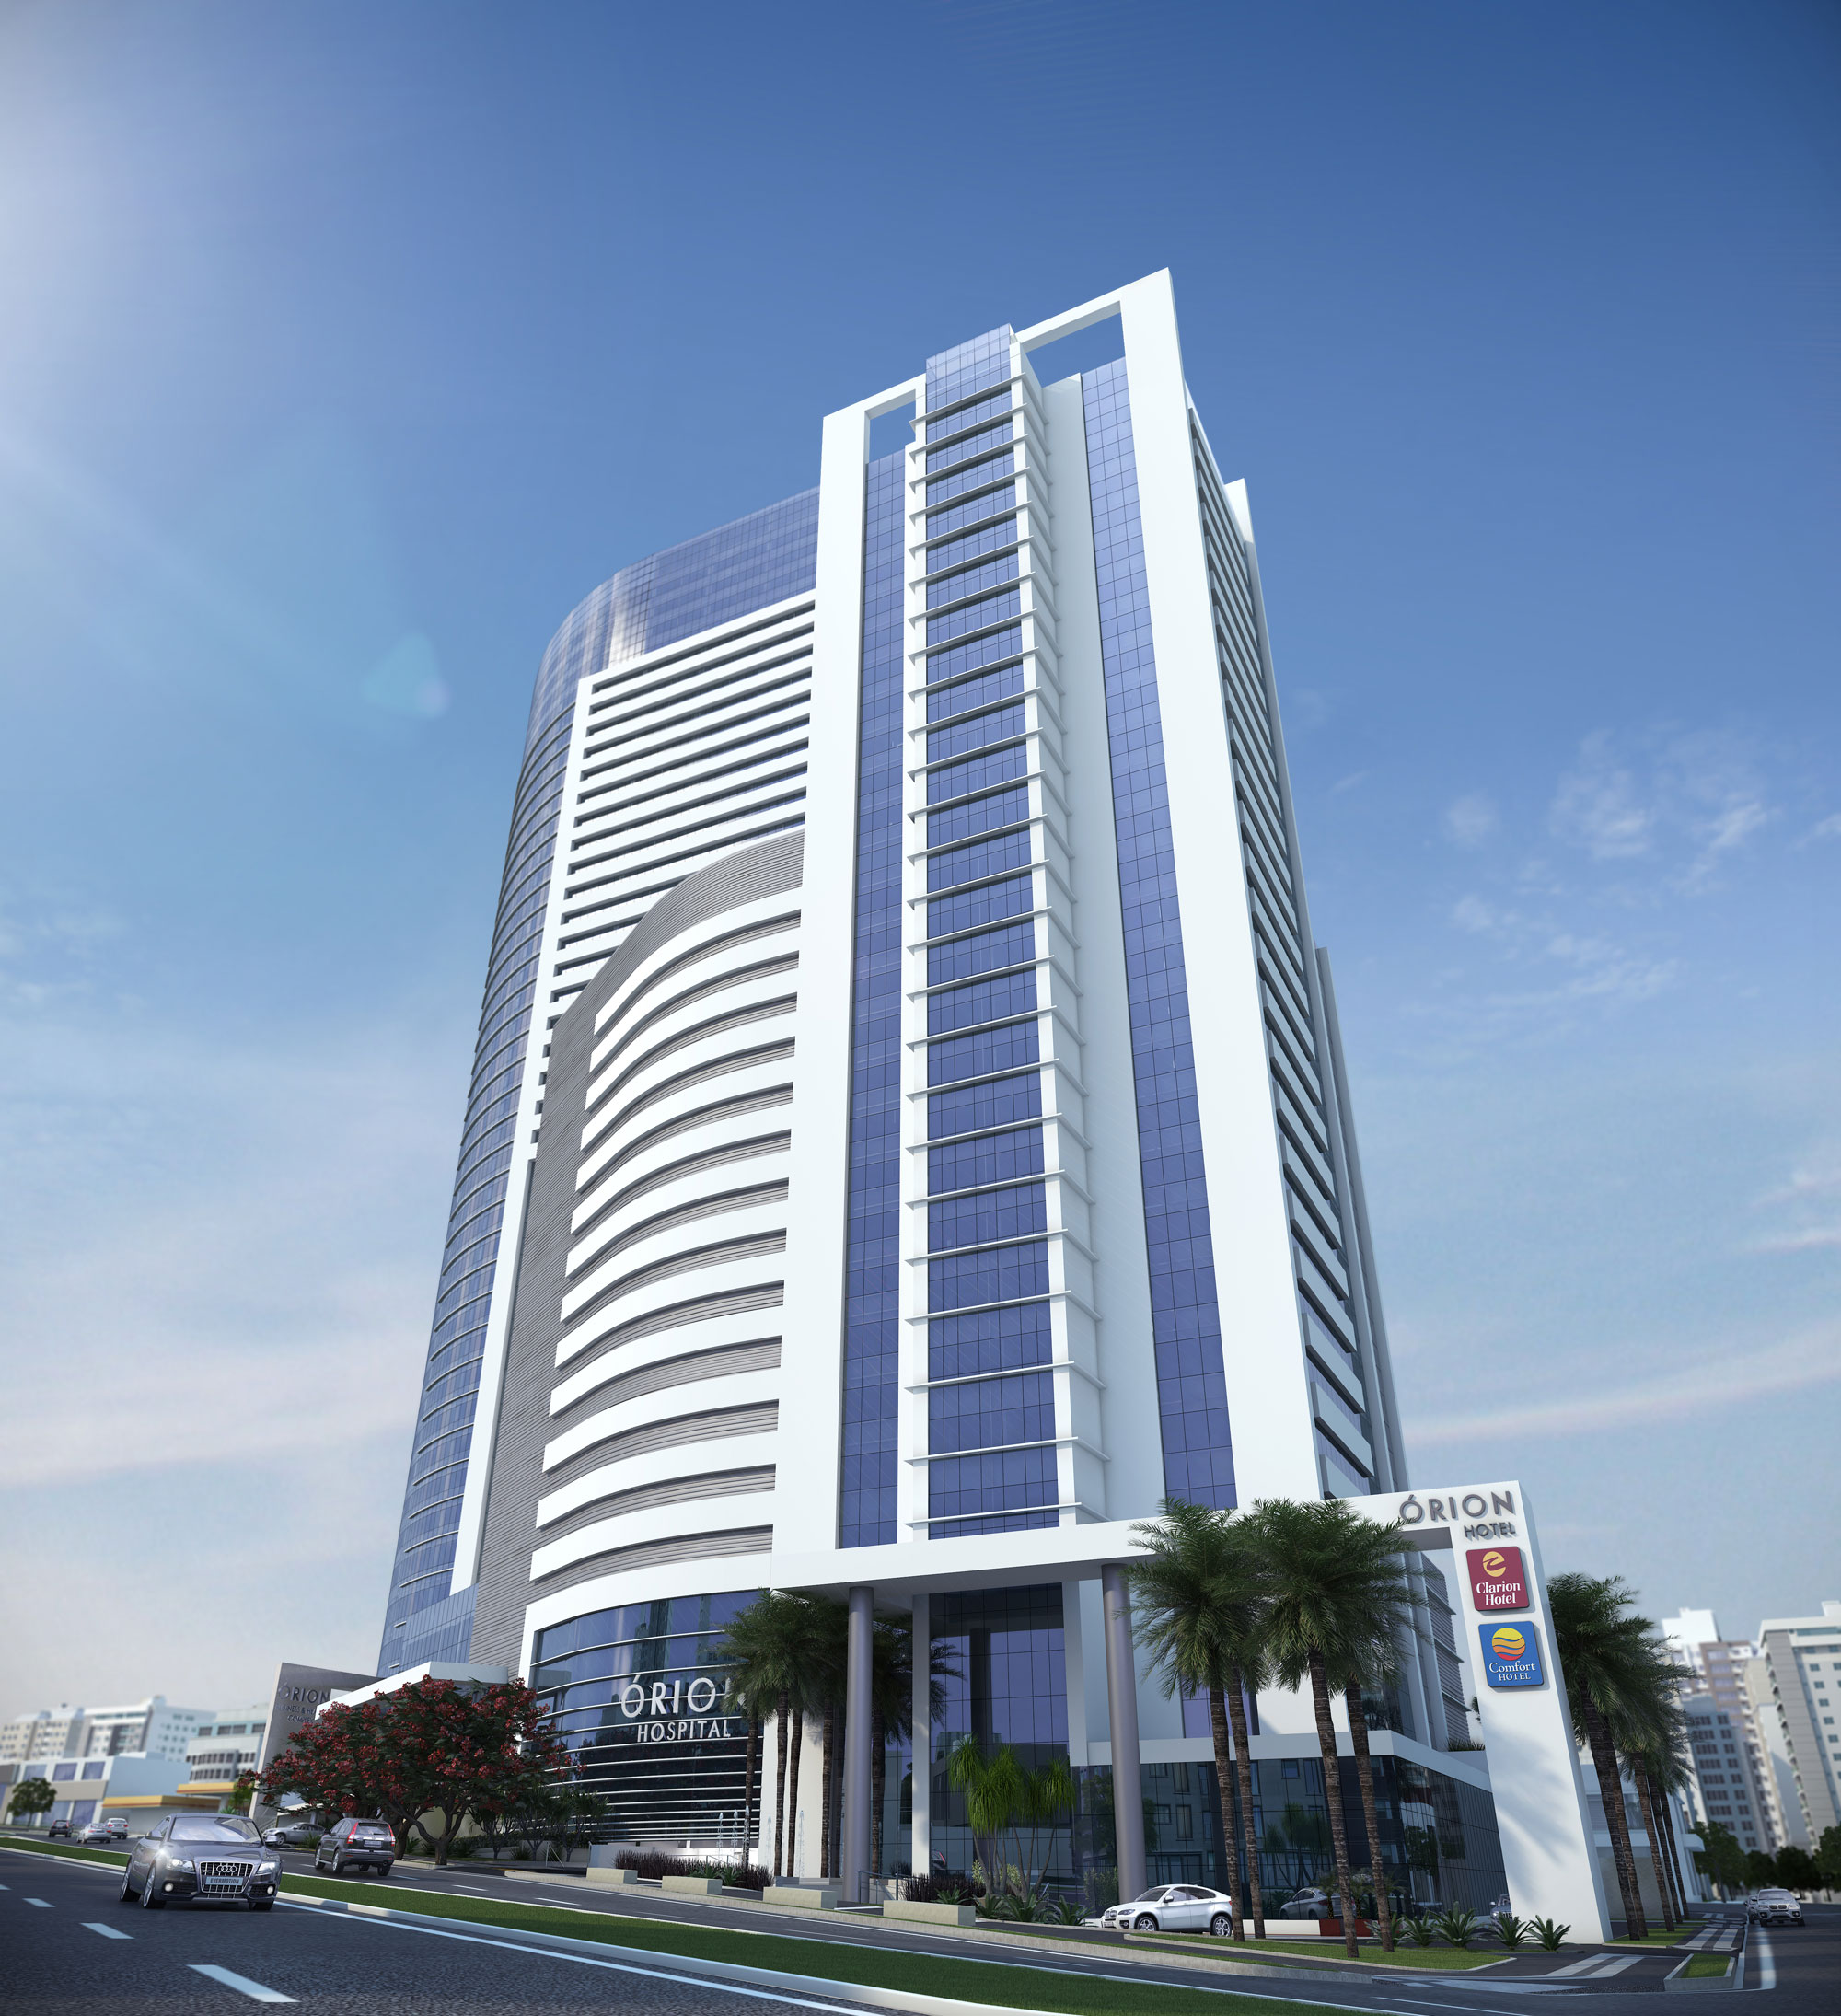 01 fachada hotel